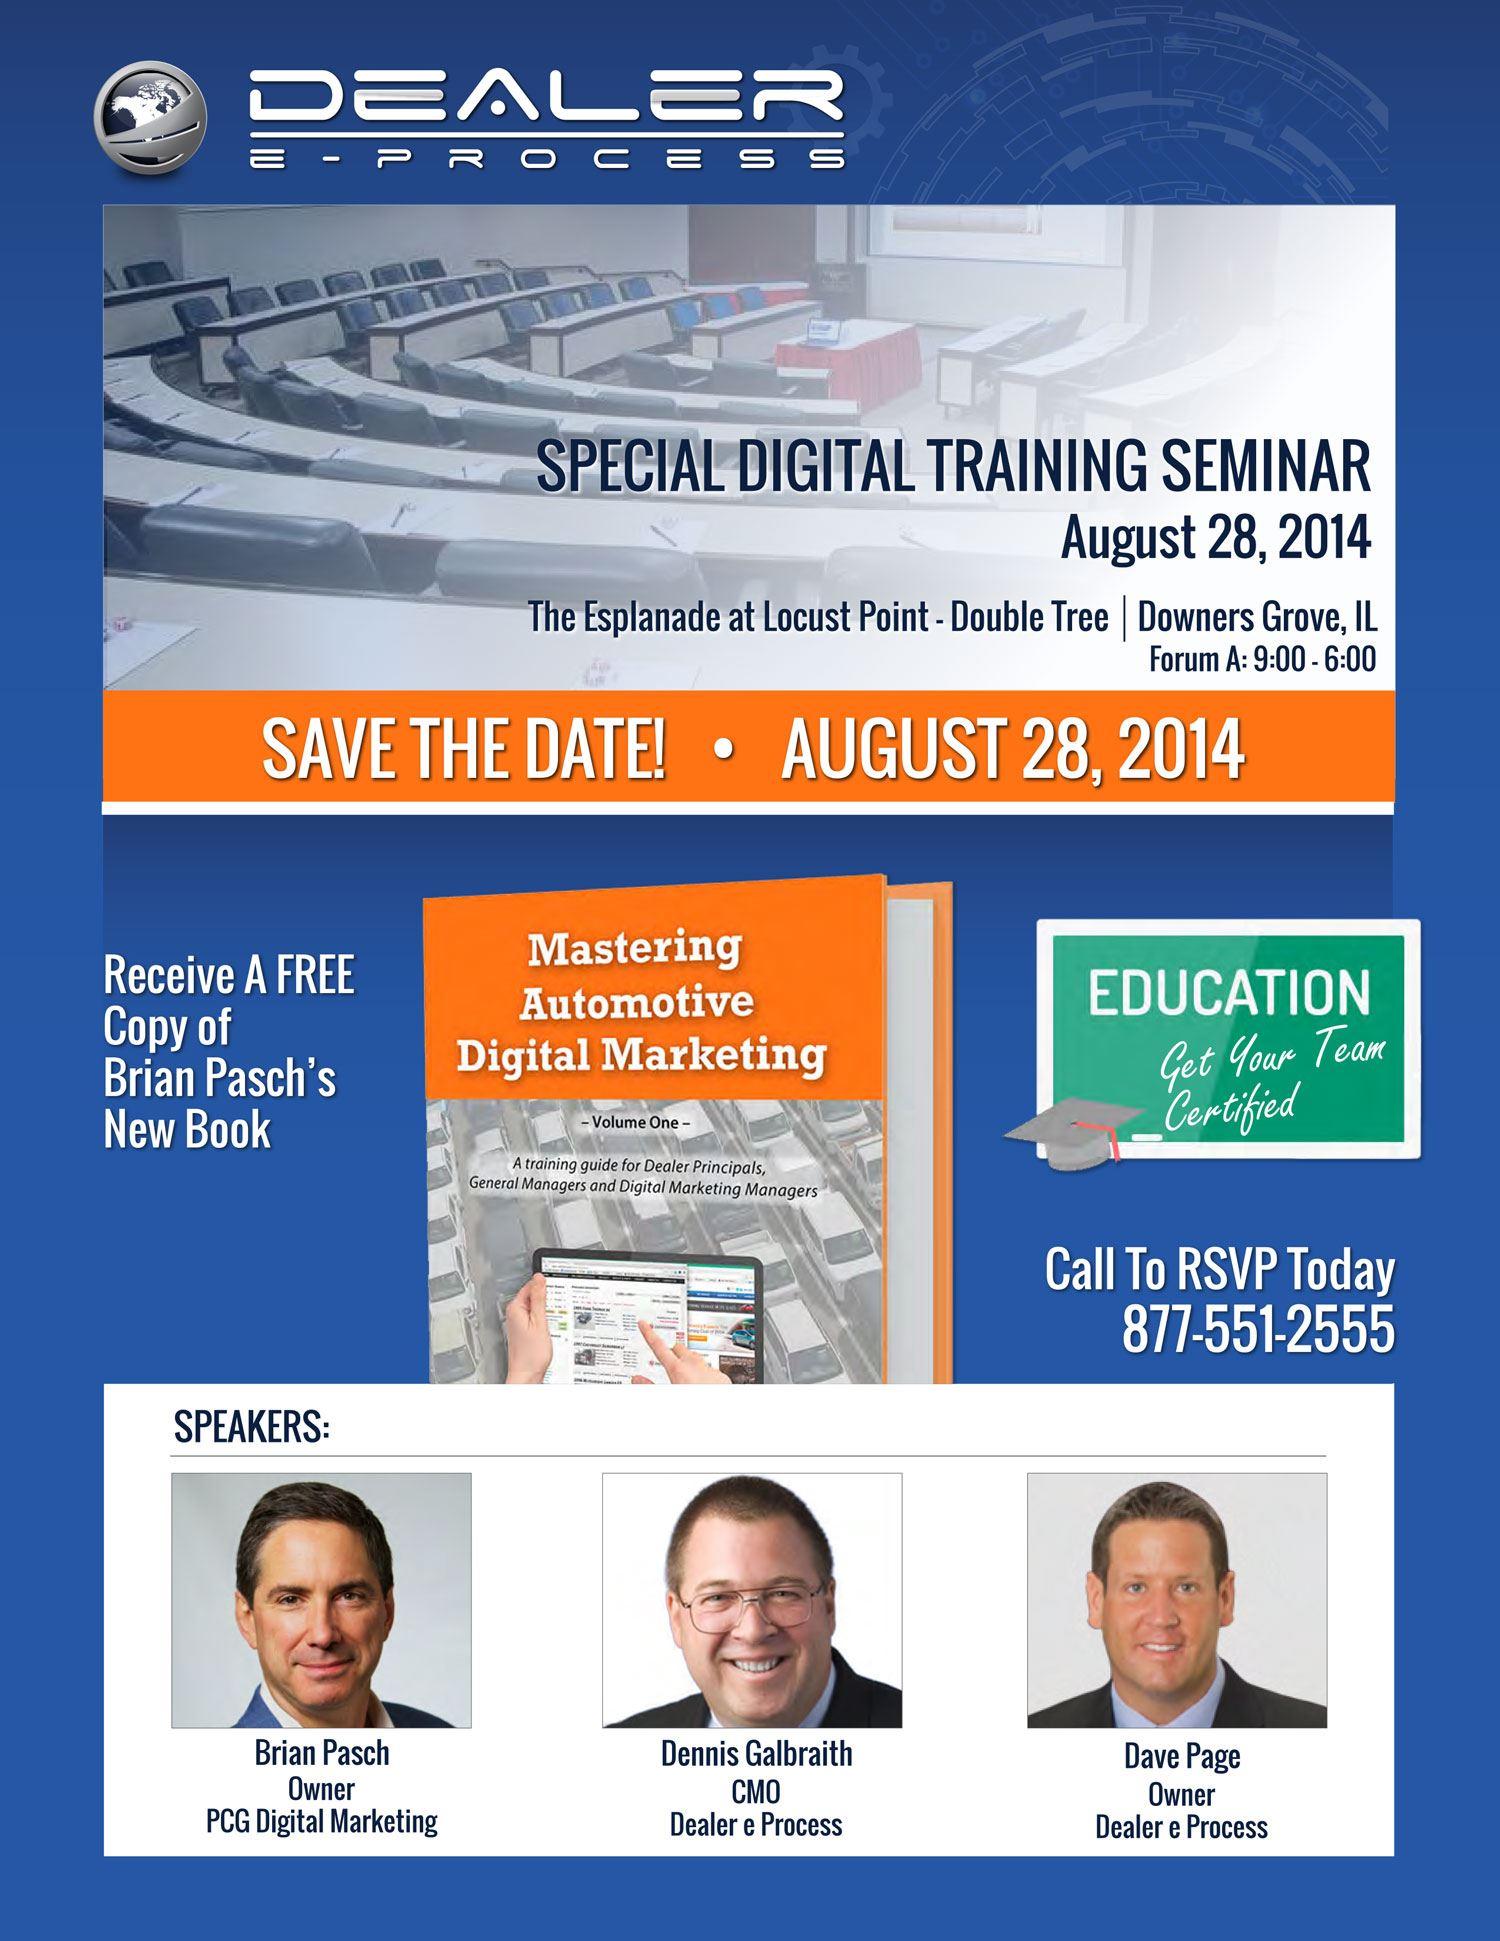 Special Digital Training Seminar page 1